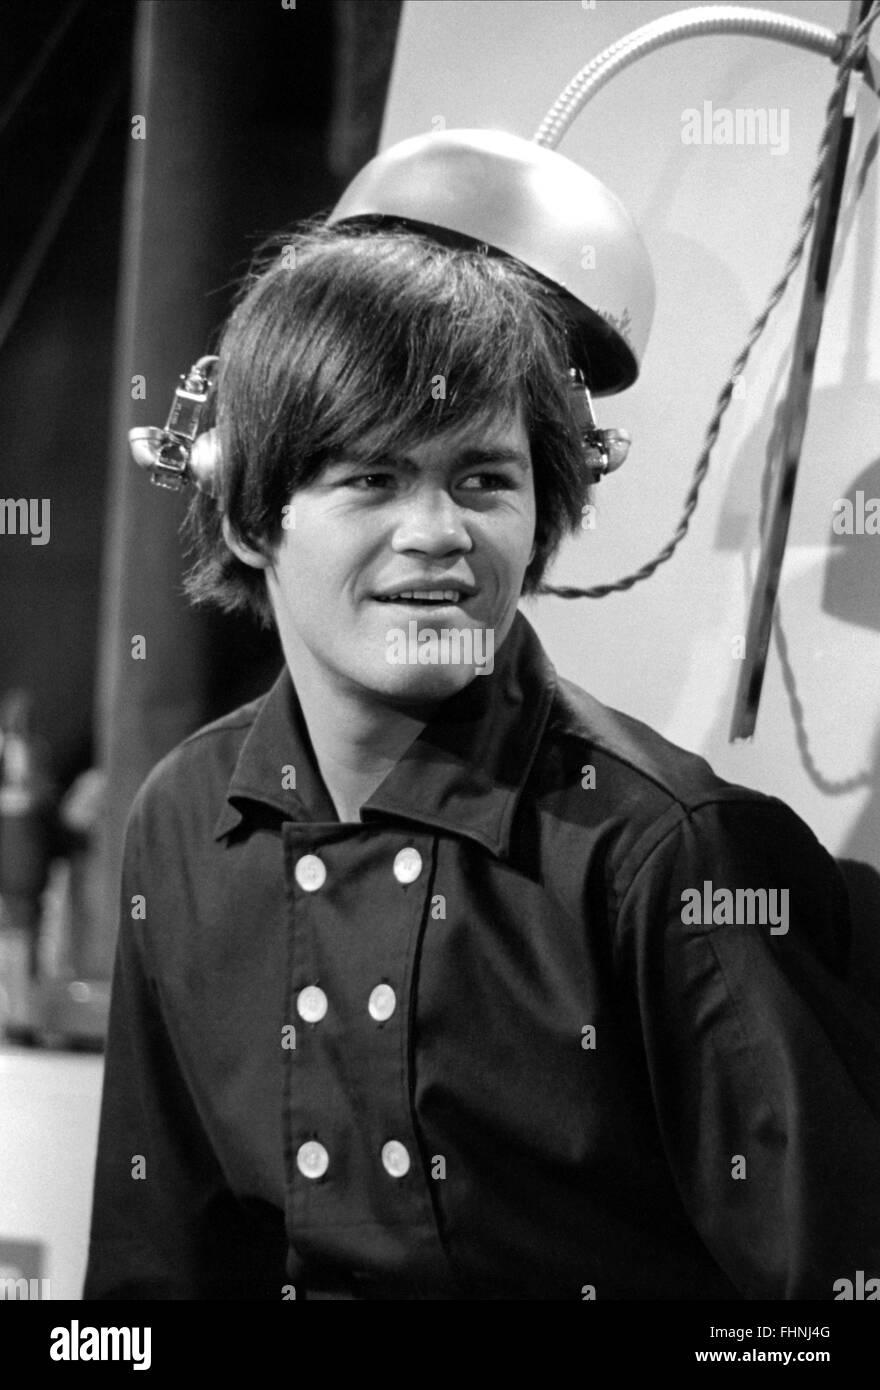 Micky Dolenz Monkees